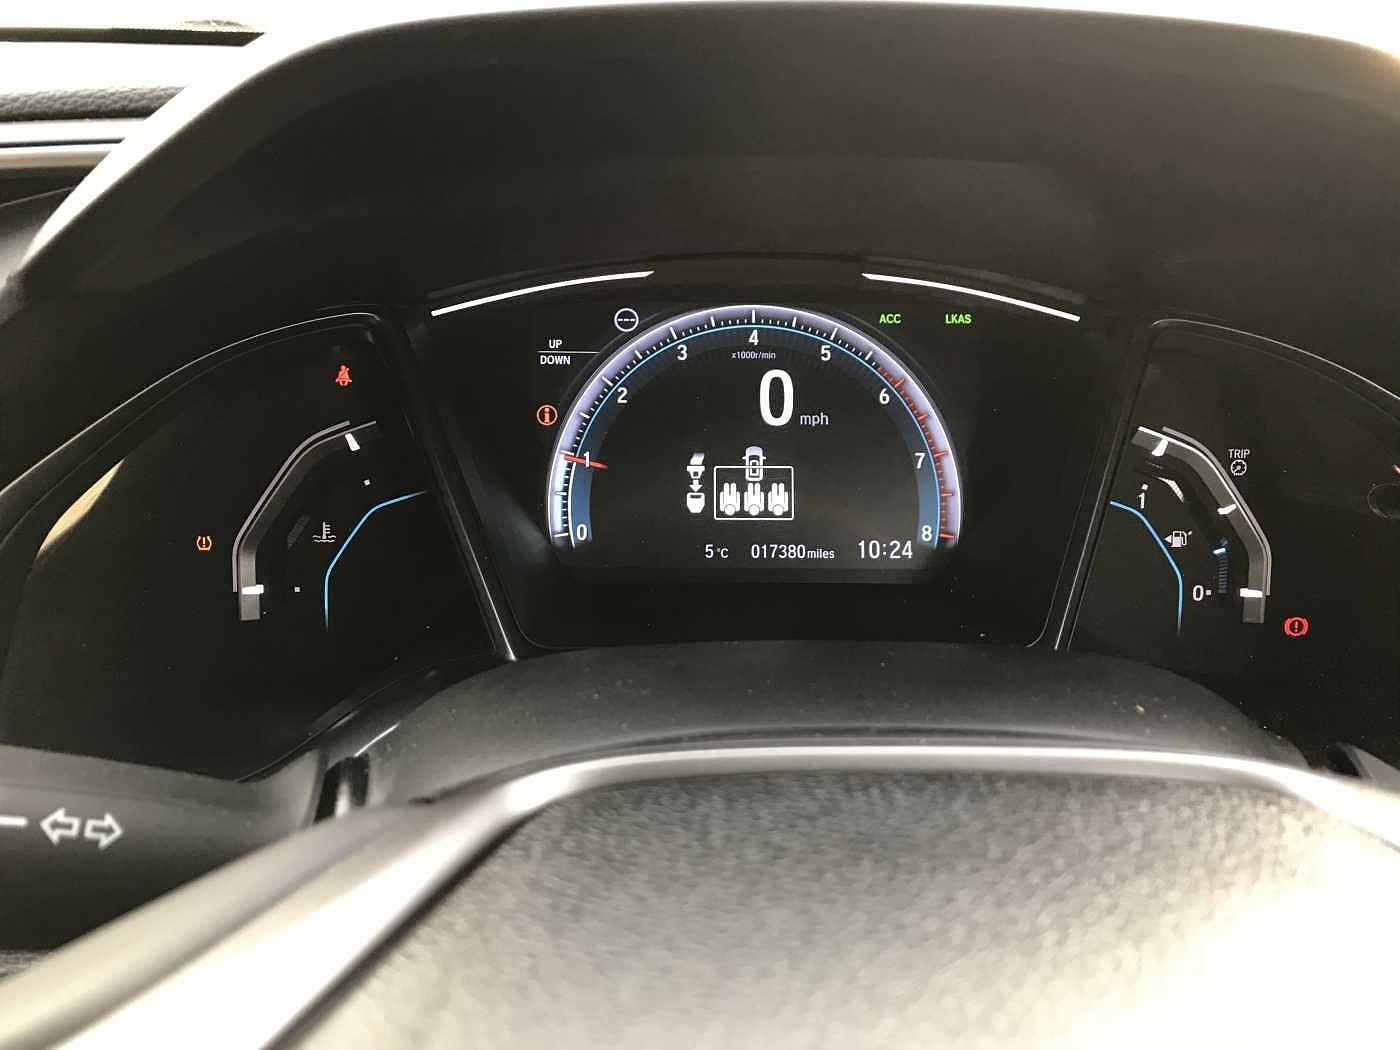 Honda Civic Images